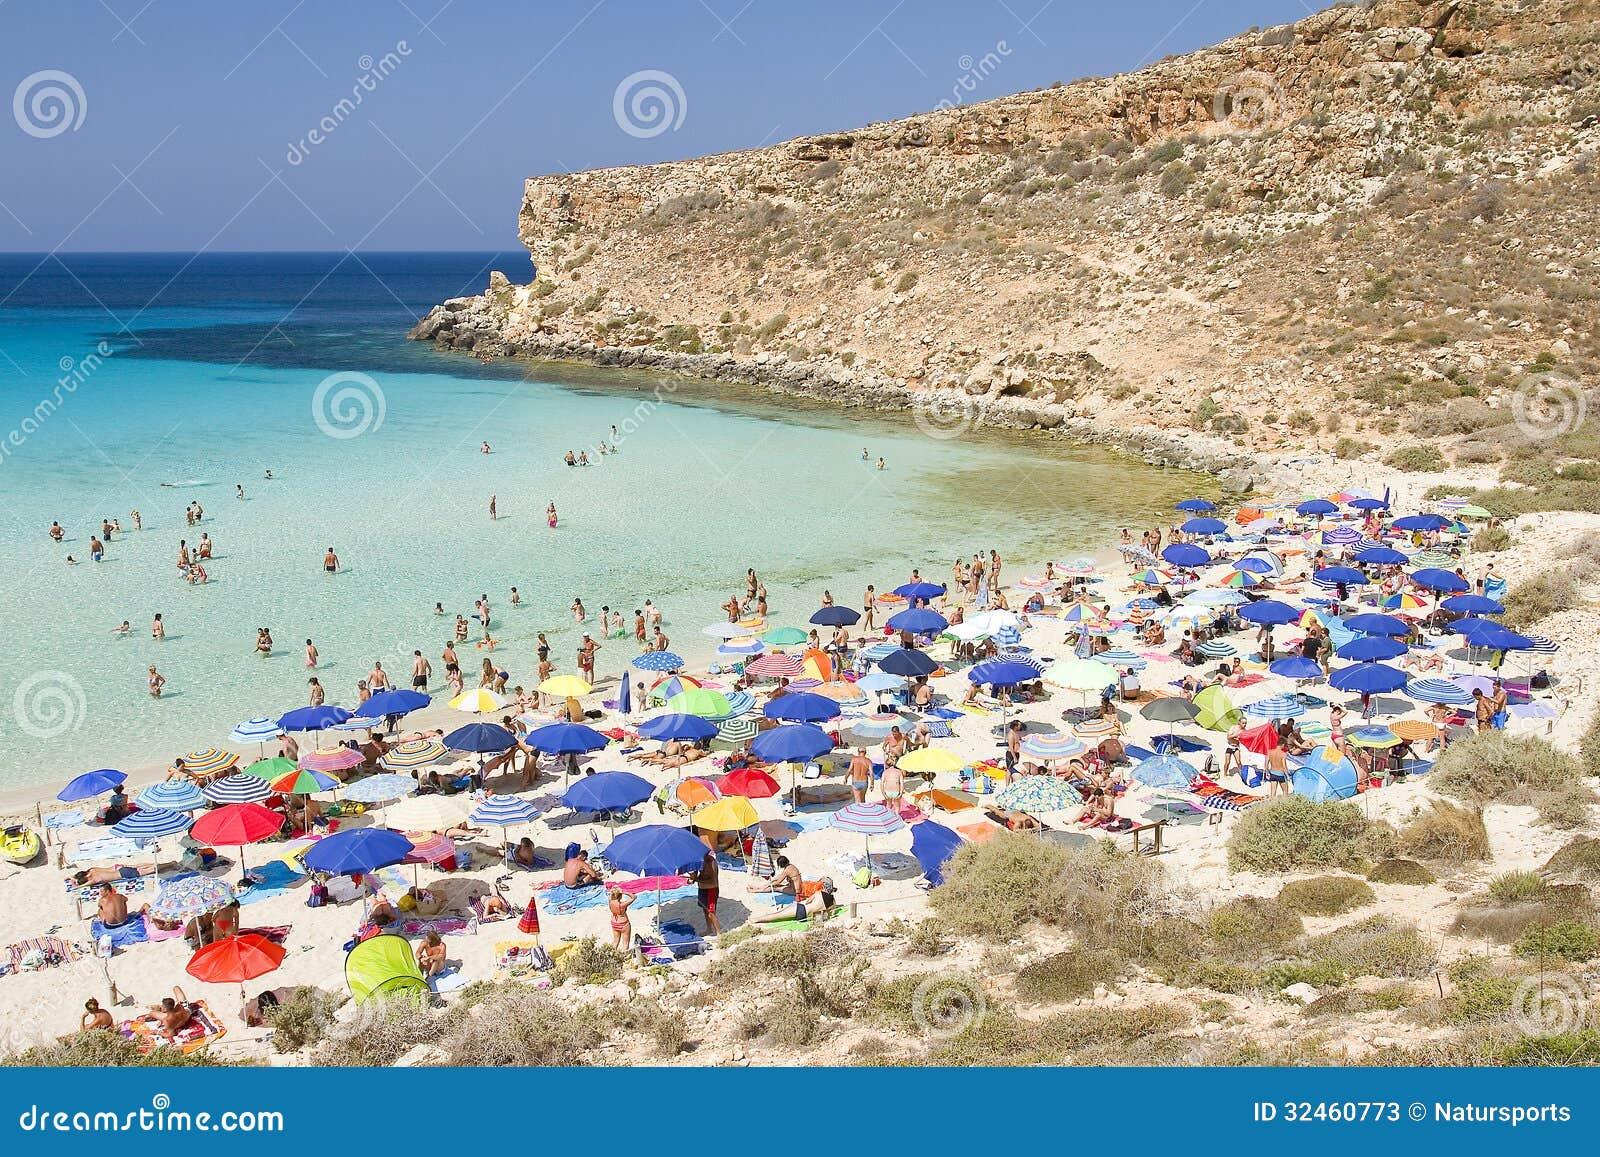 Beach of Conigli, Lampedusa